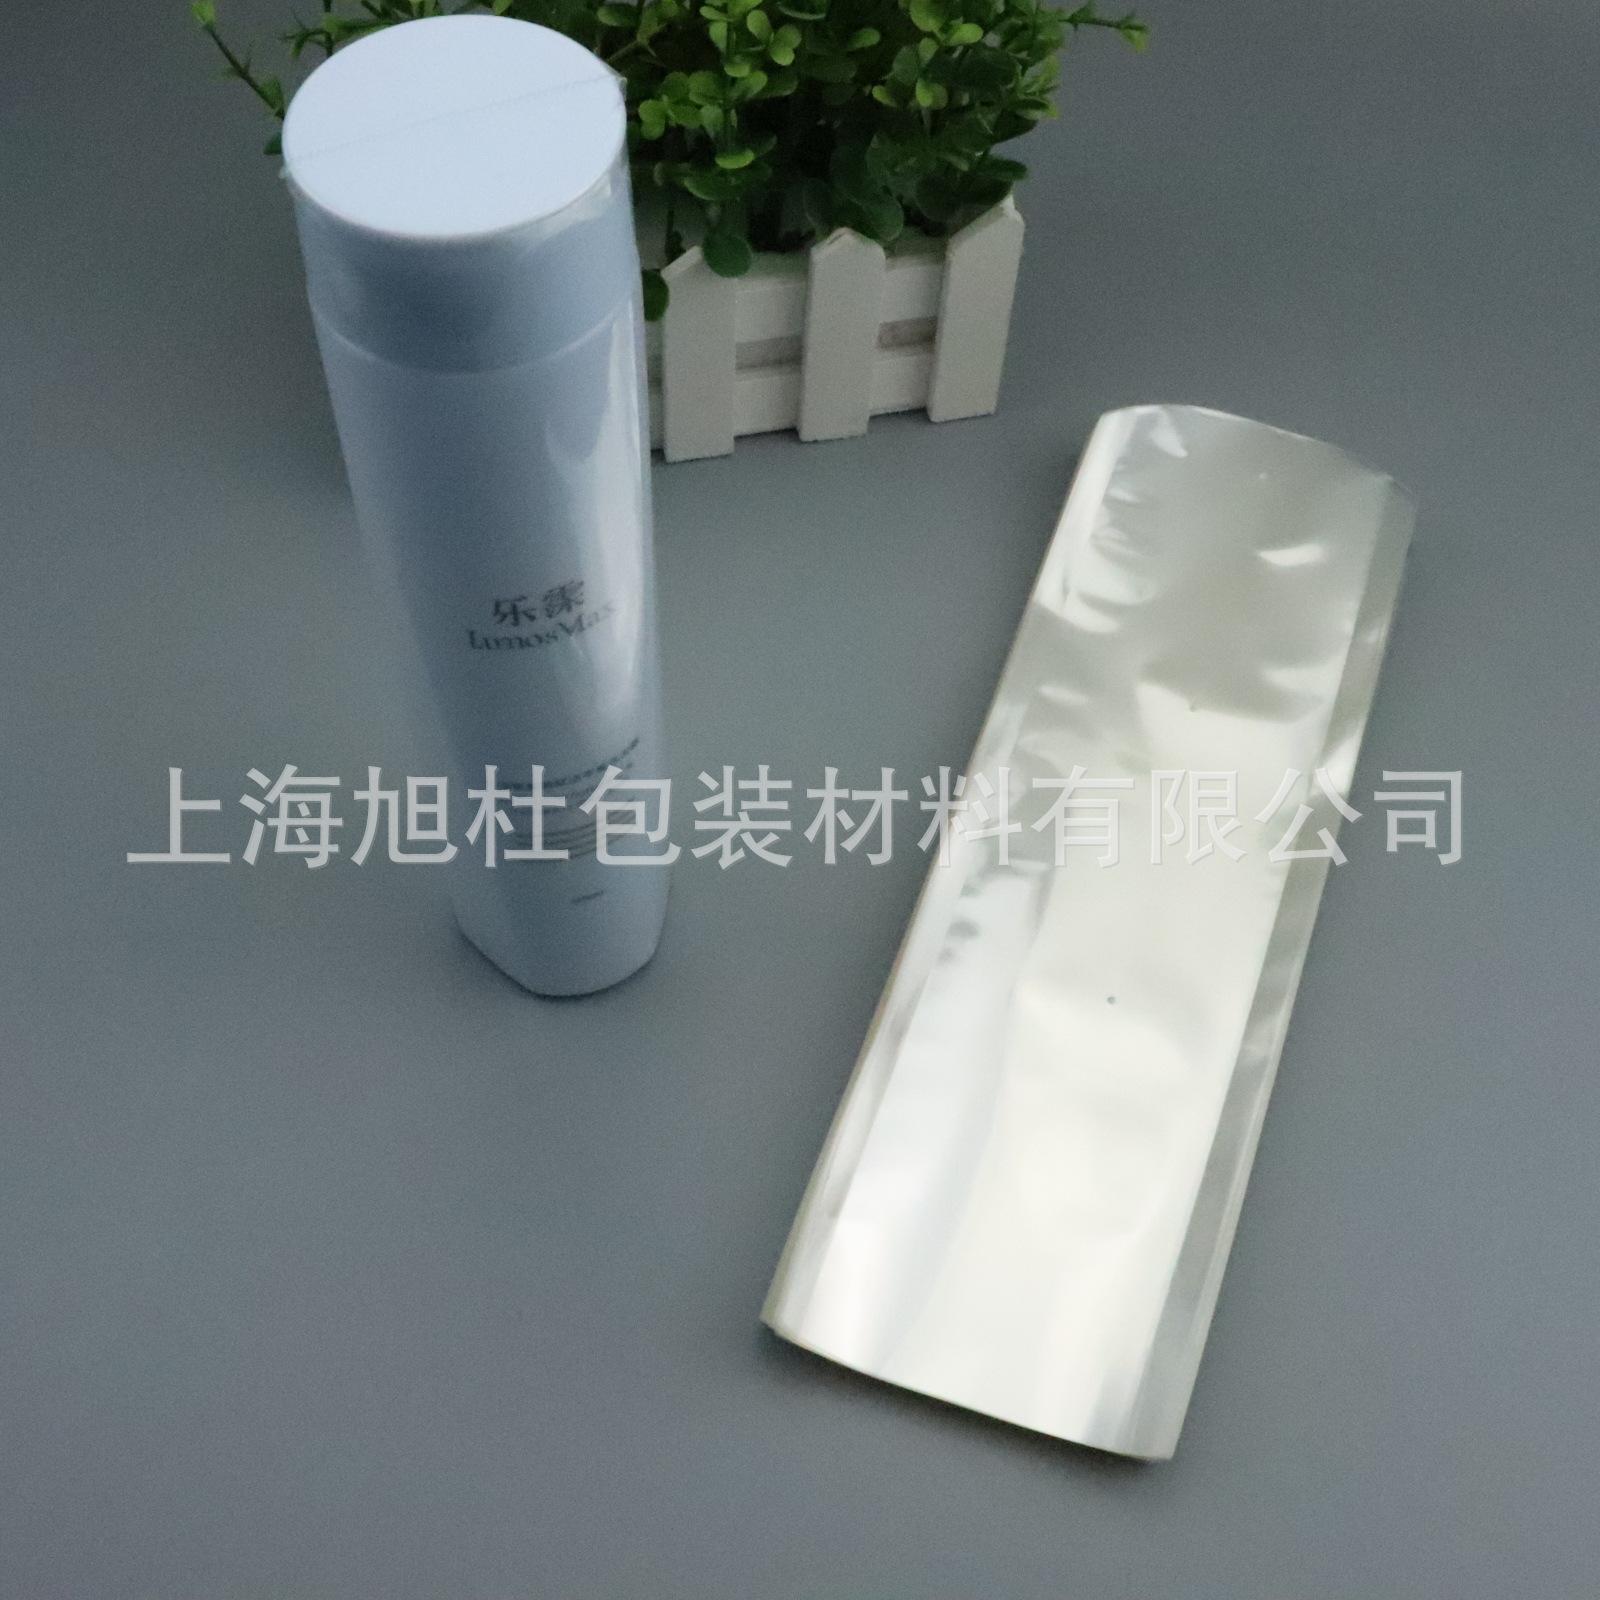 PVC圆弧袋 PVC平底袋 化妆品软管包装 PVC袋 现货定制发货快